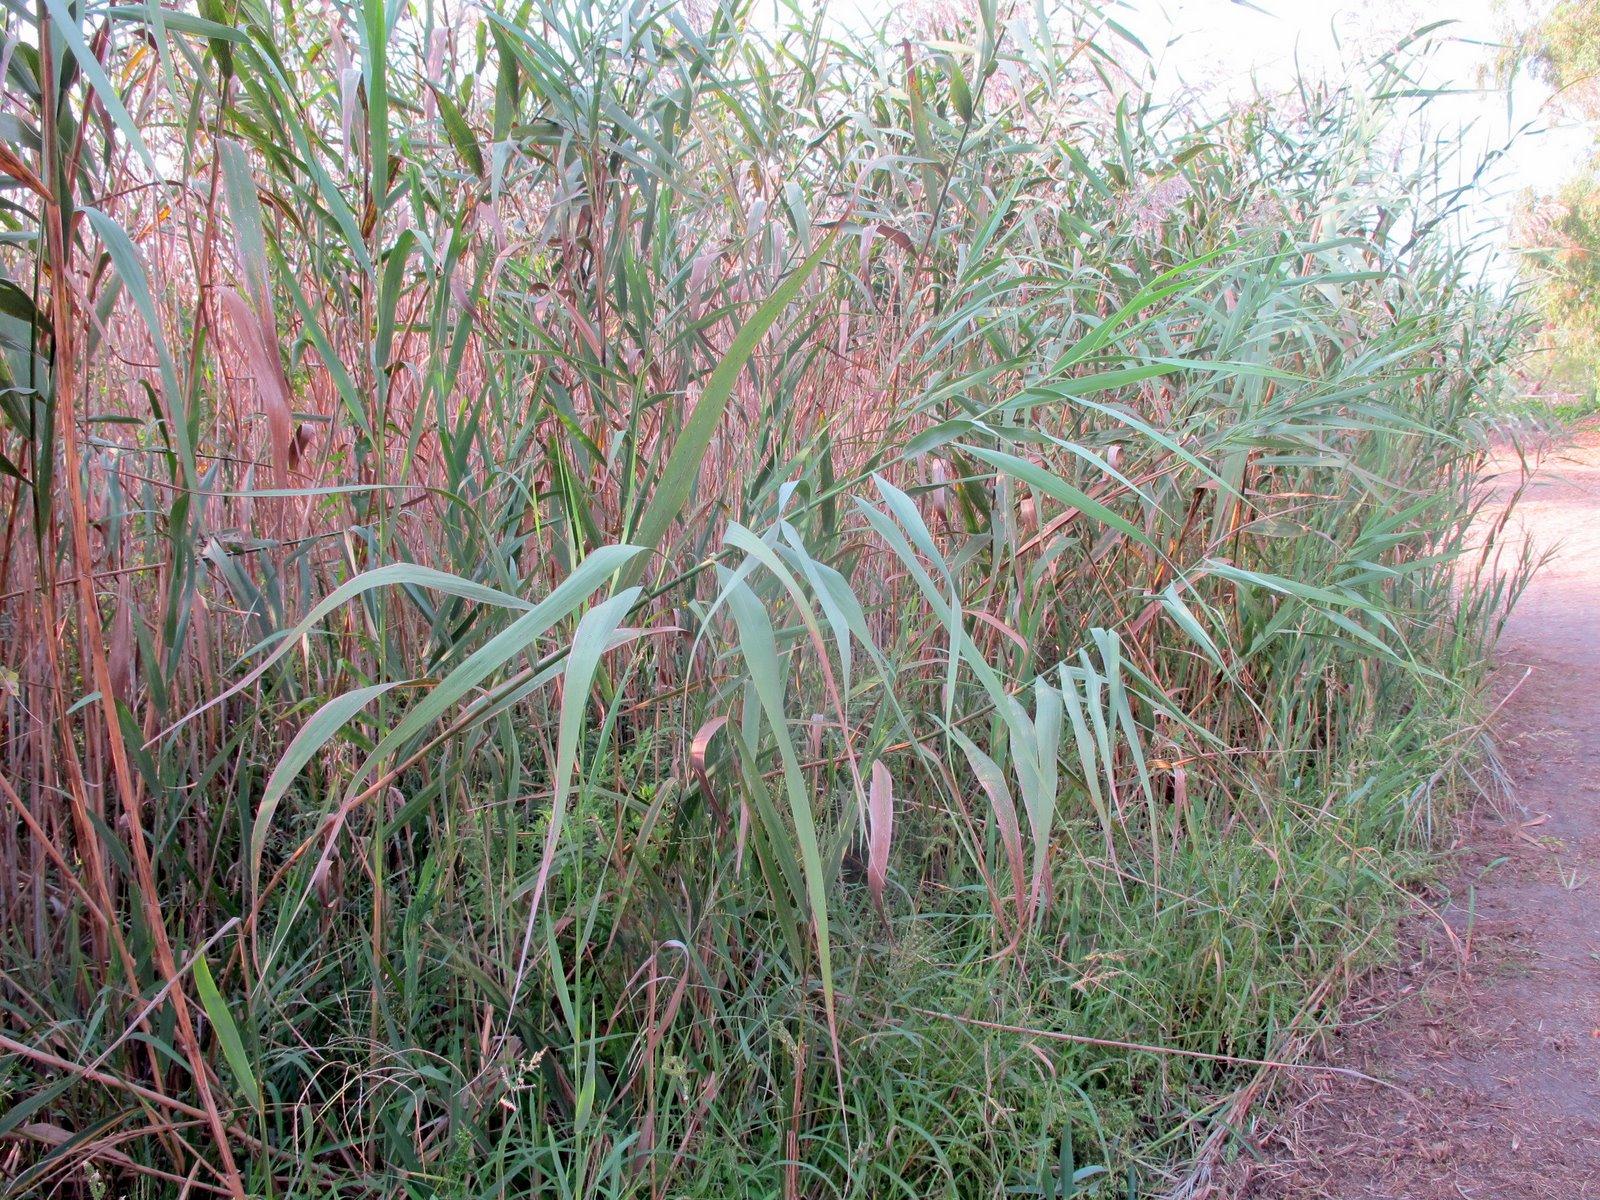 1 x Eragrostis trichoides Arco-AMORE erba ornamentali erba//erba//piante perenni